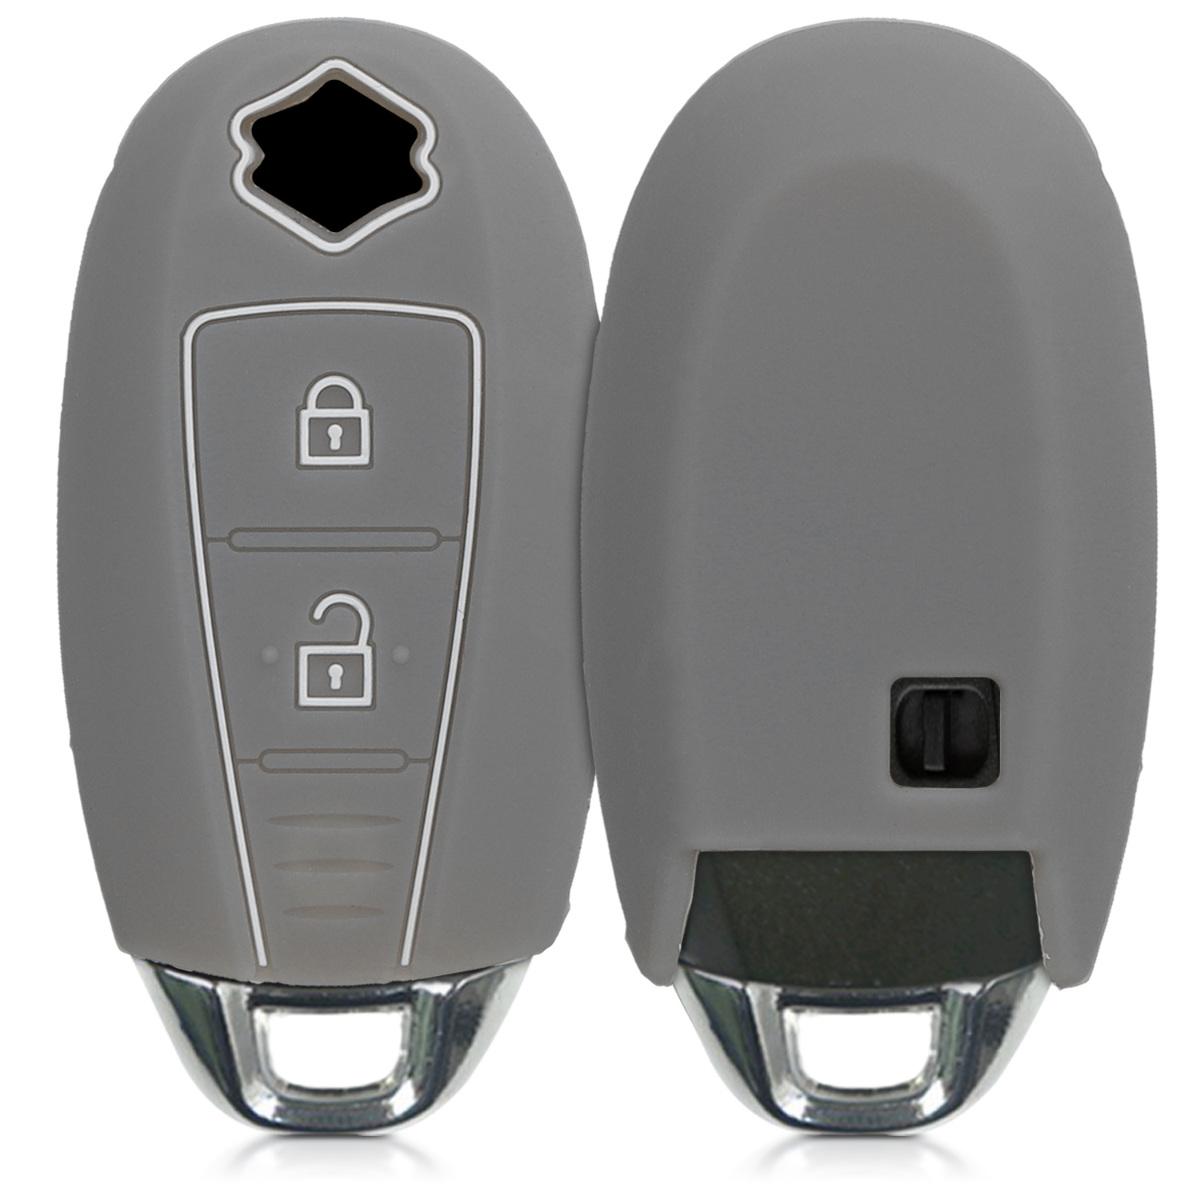 KW Θήκη Κλειδιού Suzuki - Σιλικόνη - 2 κουμπιά - grey / black (47668.02)